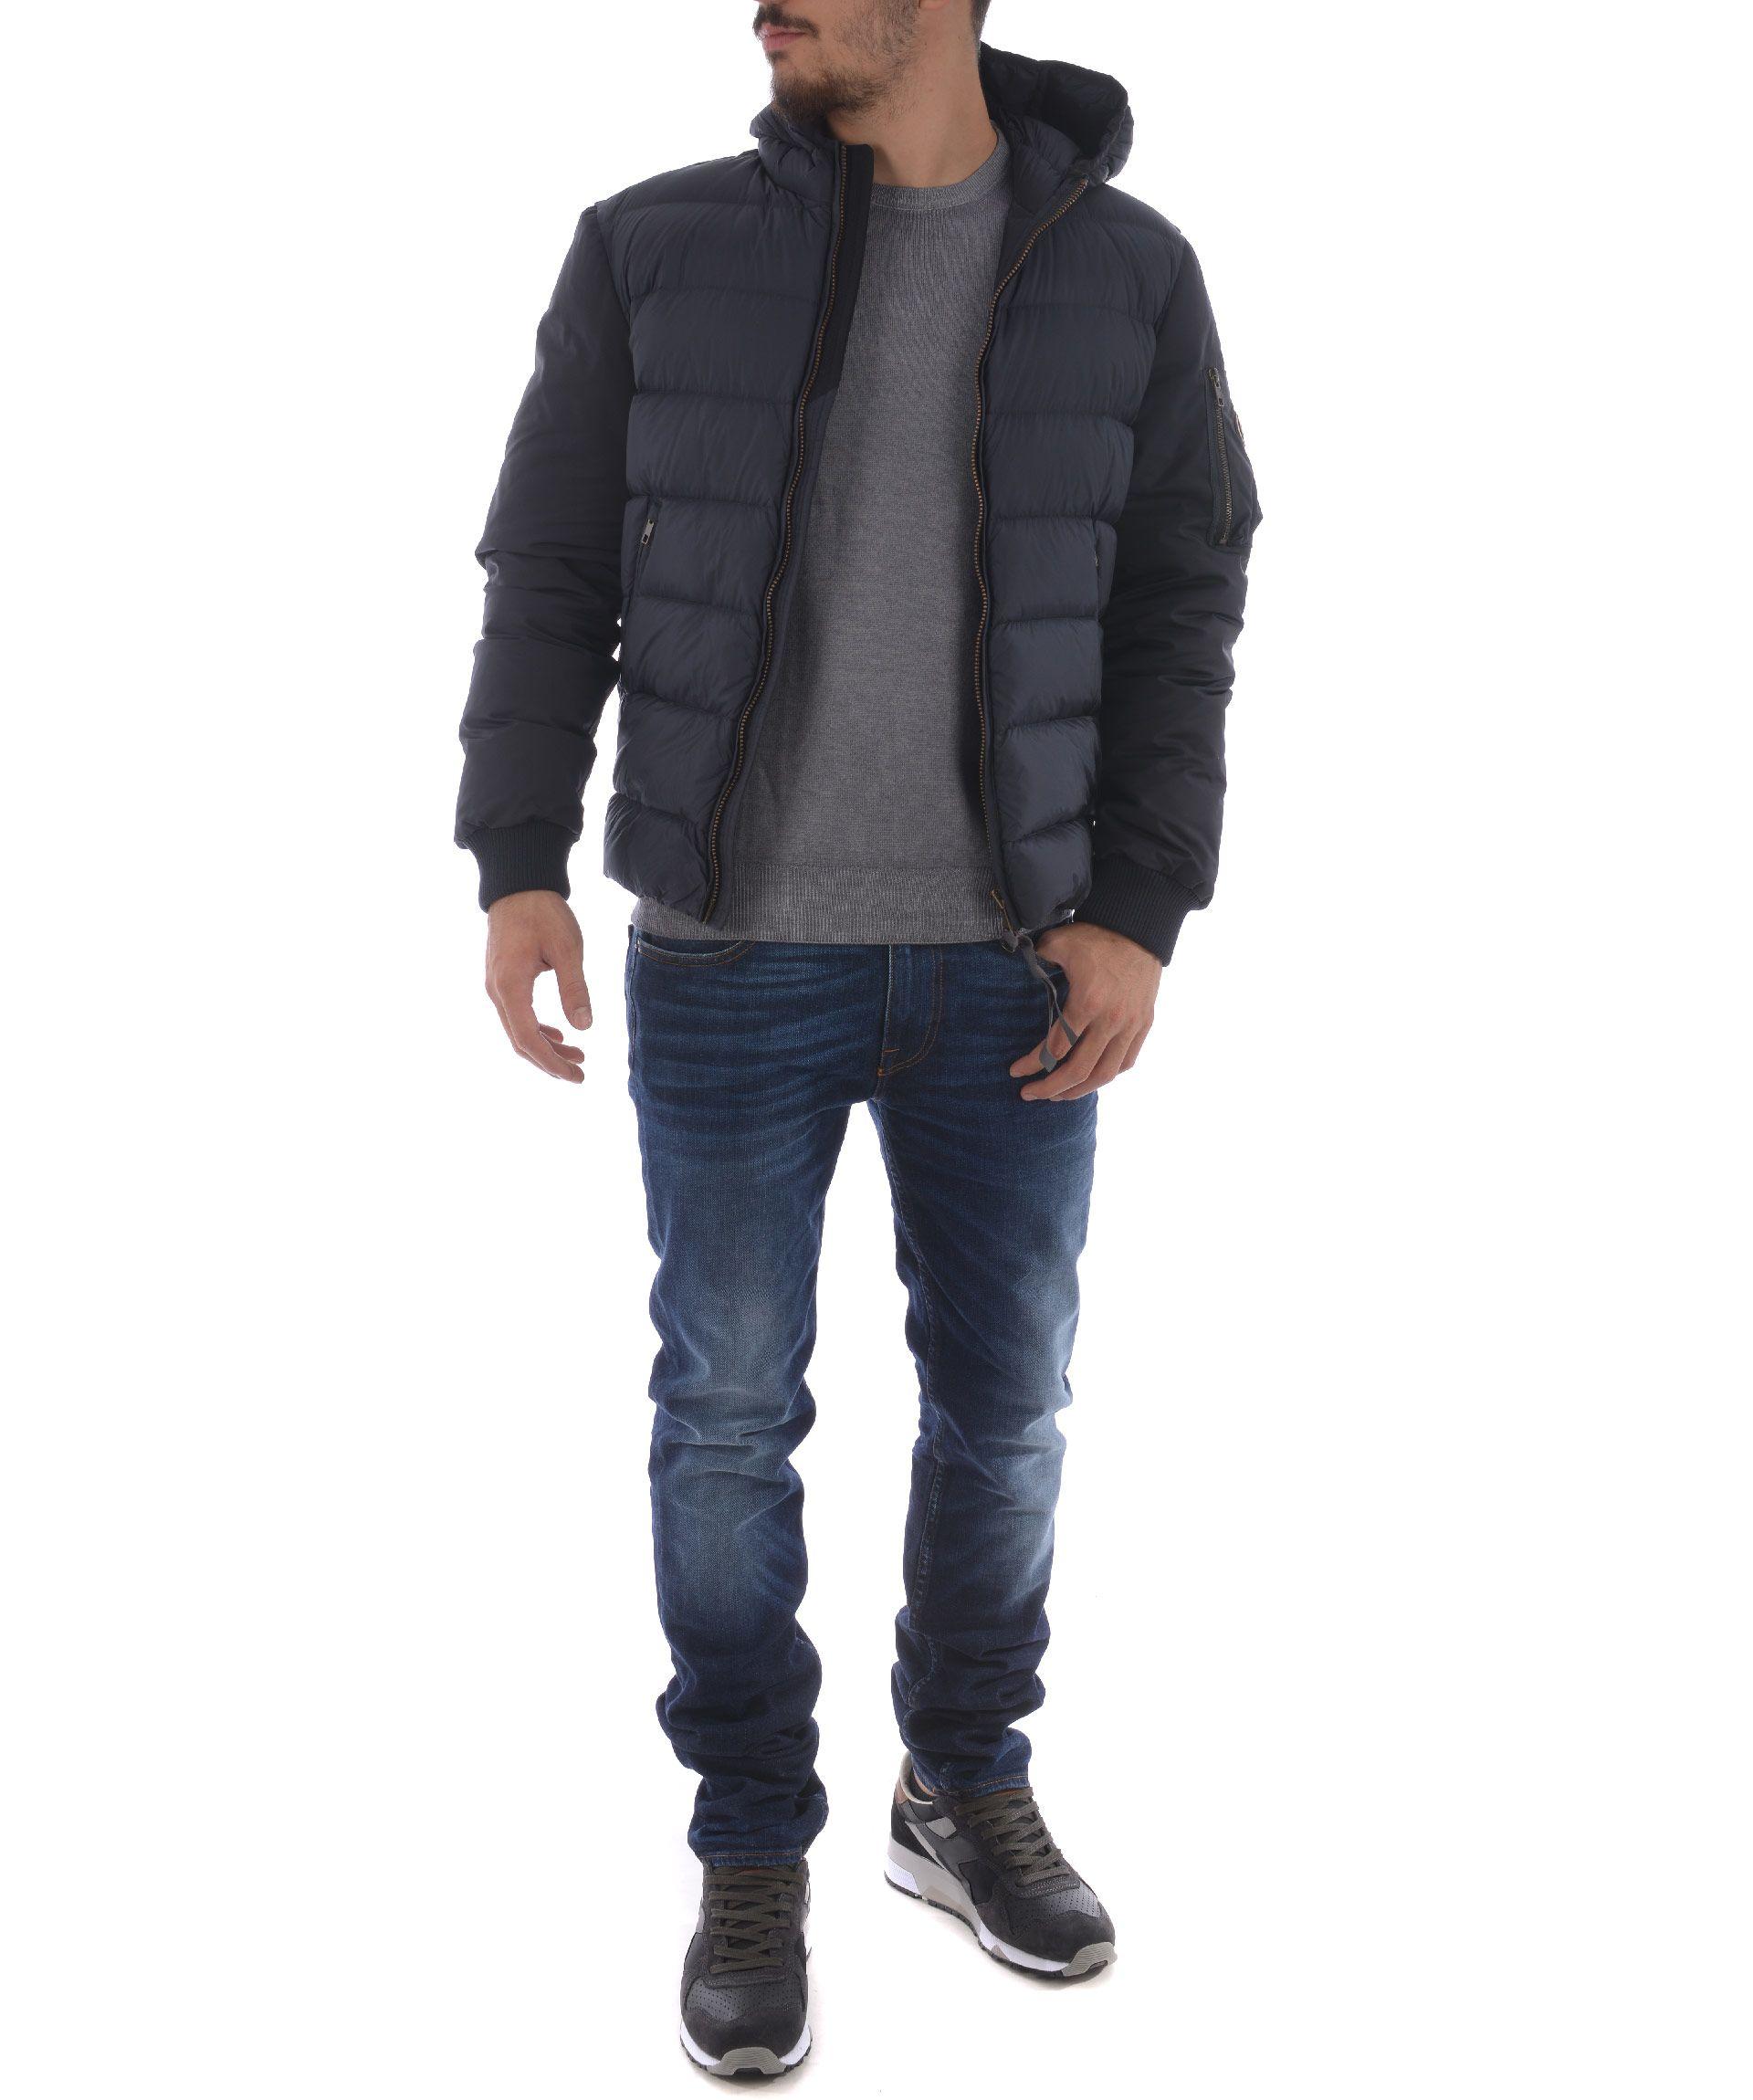 Colmar Zip Pocket Down Jacket